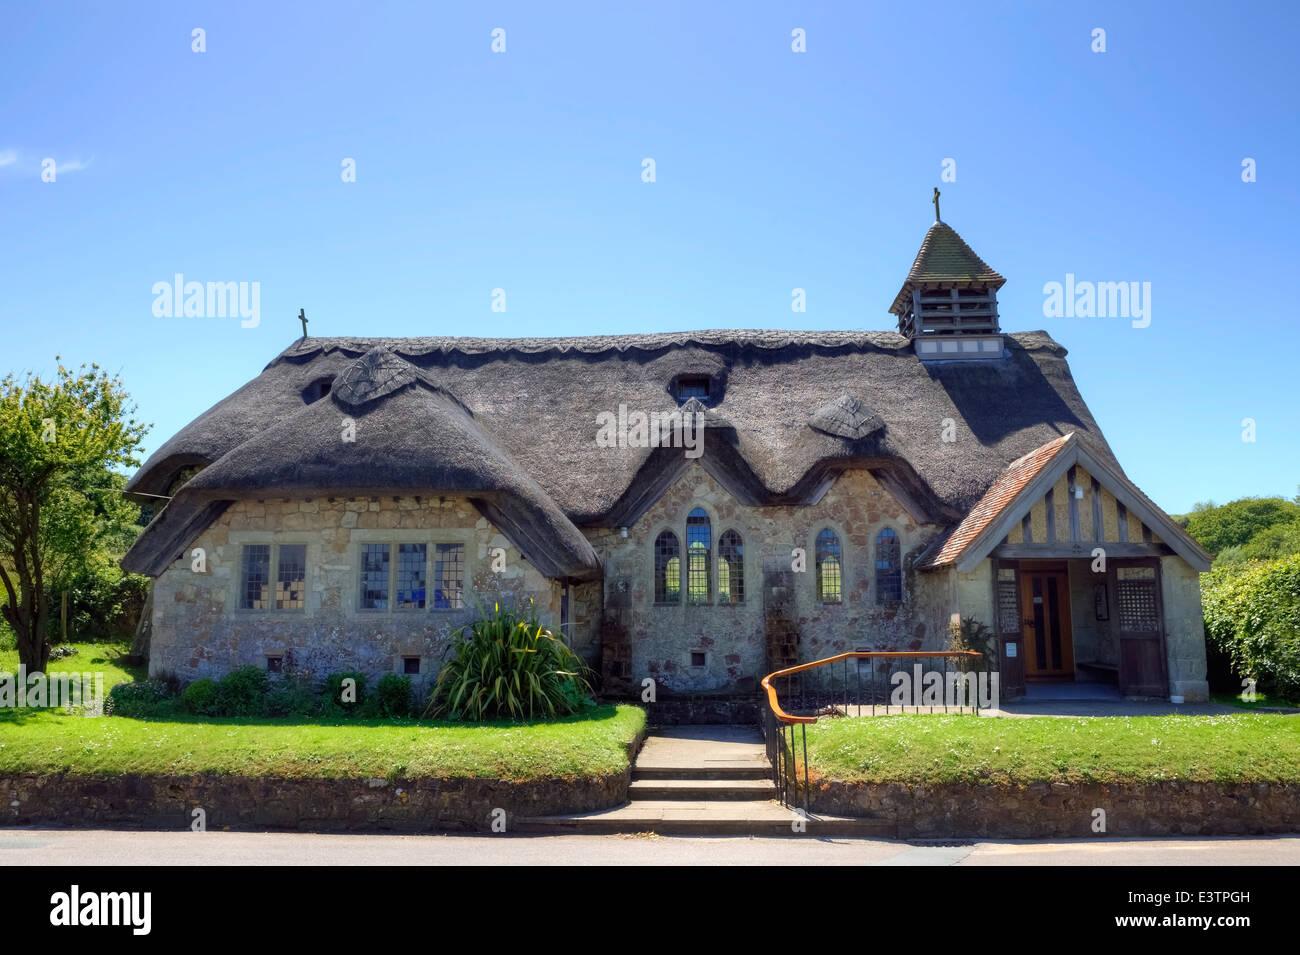 St Agnes church, Freshwater, Isle of Wight, England, United Kingdom - Stock Image